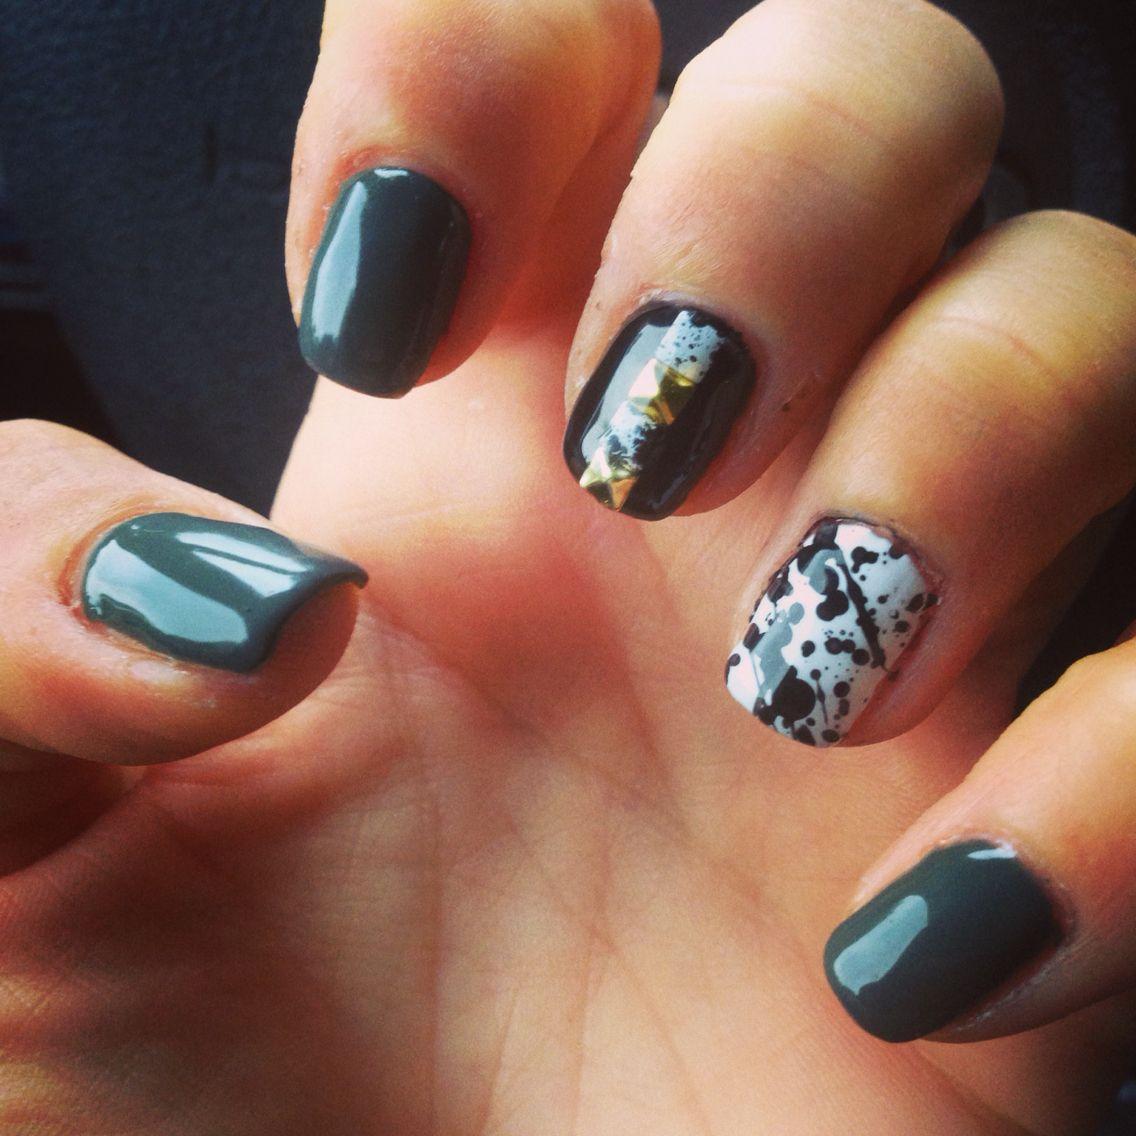 Splatter paint and stud manicure courtesy of Diva Nails, Mineola, NY ...